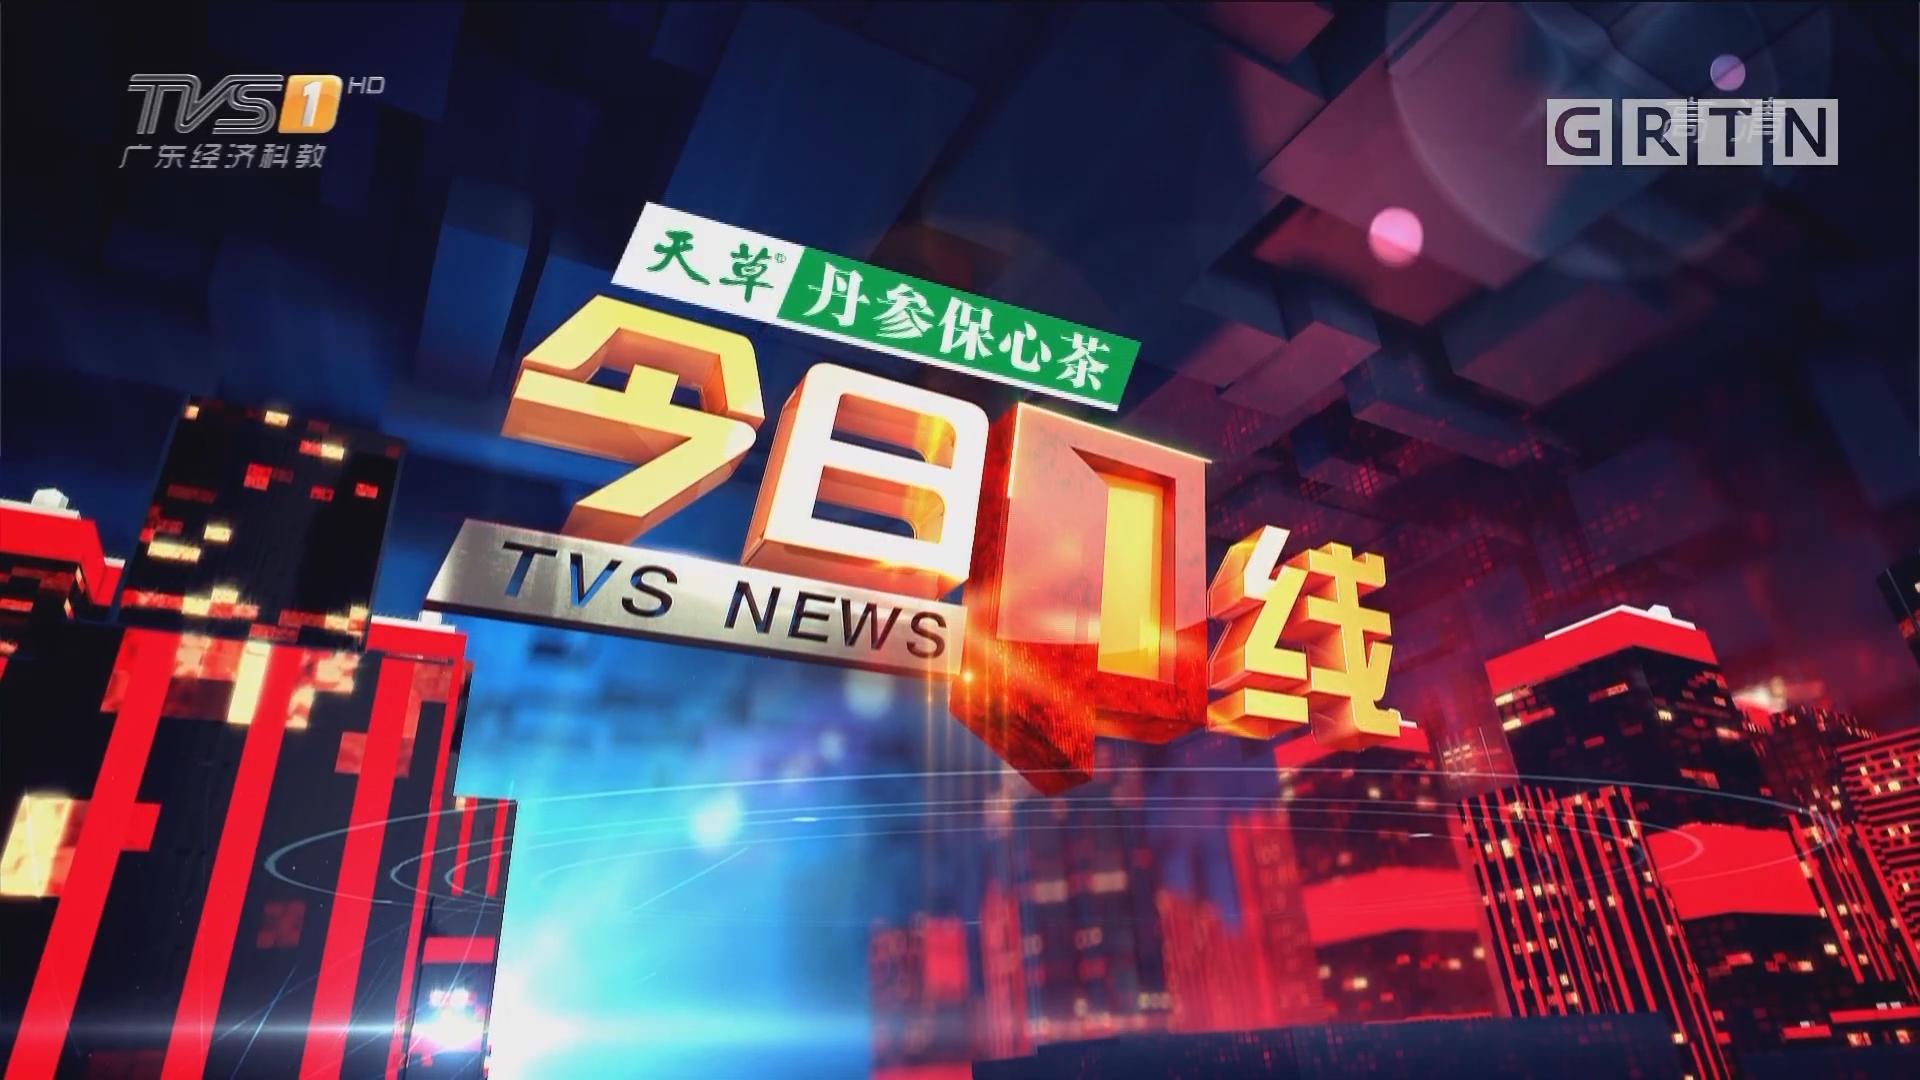 [HD][2018-02-23]今日一线:关注出租车营运乱象:广州 2公里路程 的士最少要价30